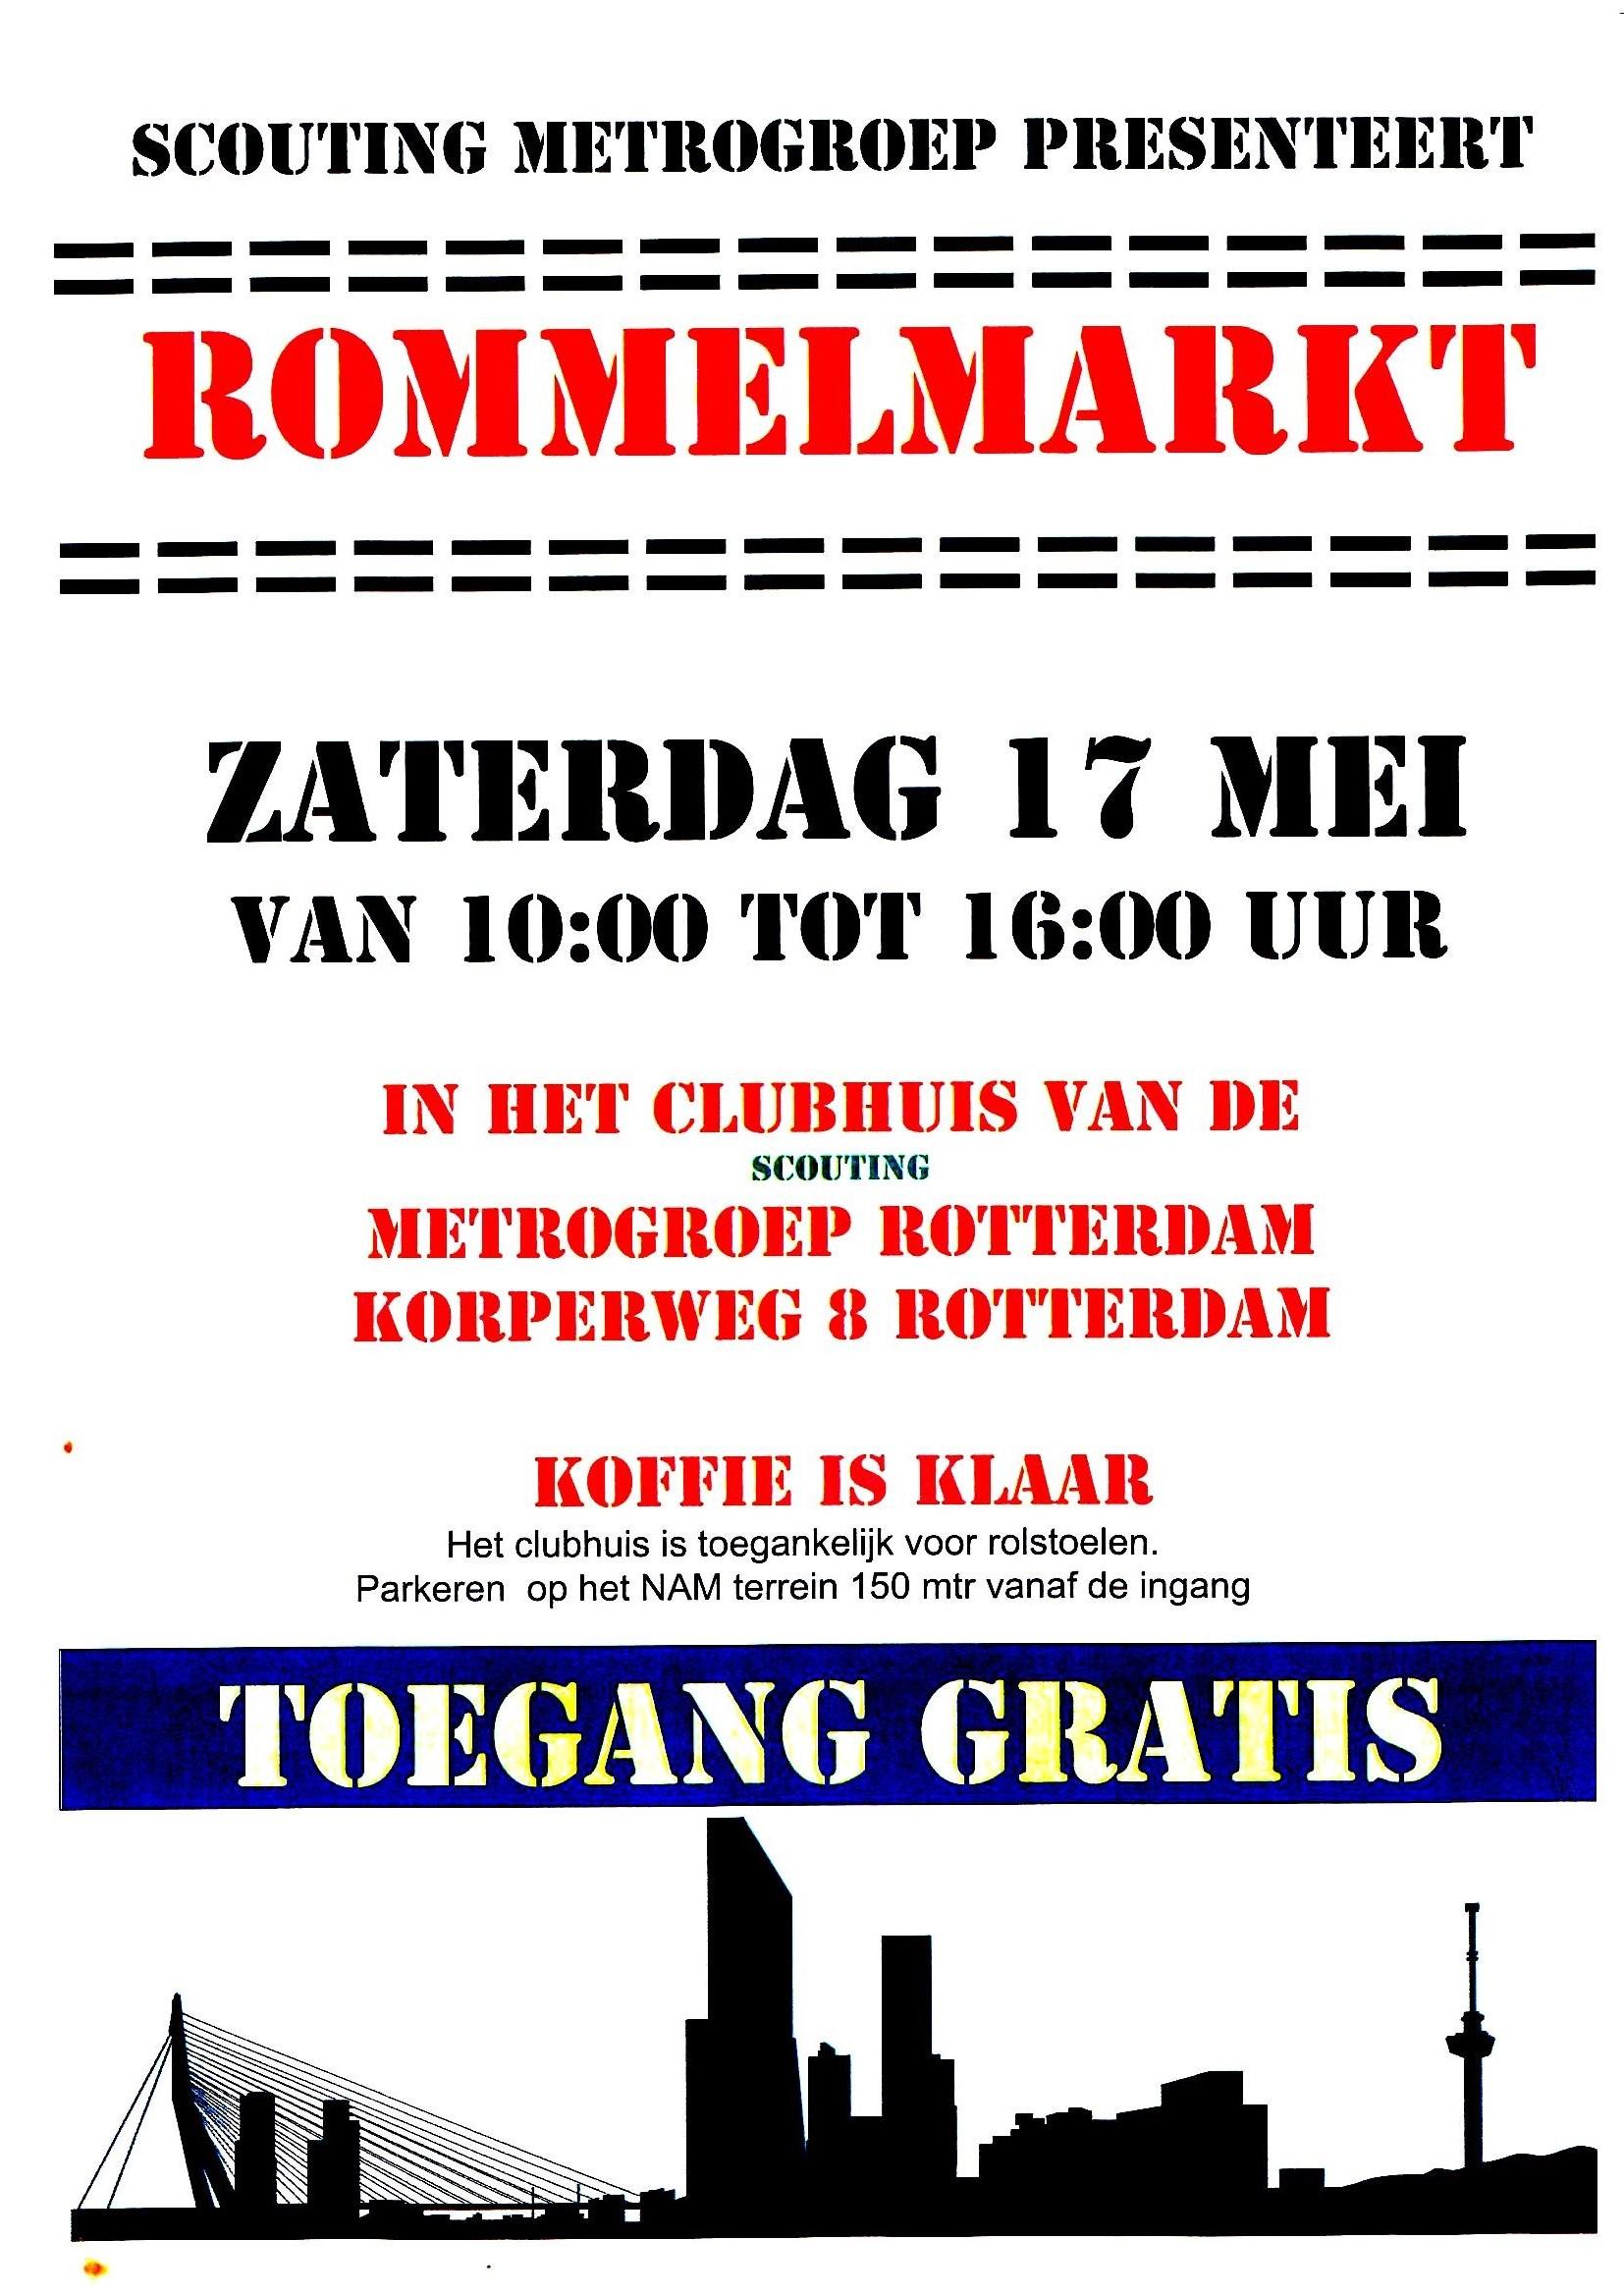 Metrogroep_Rommelmarkt